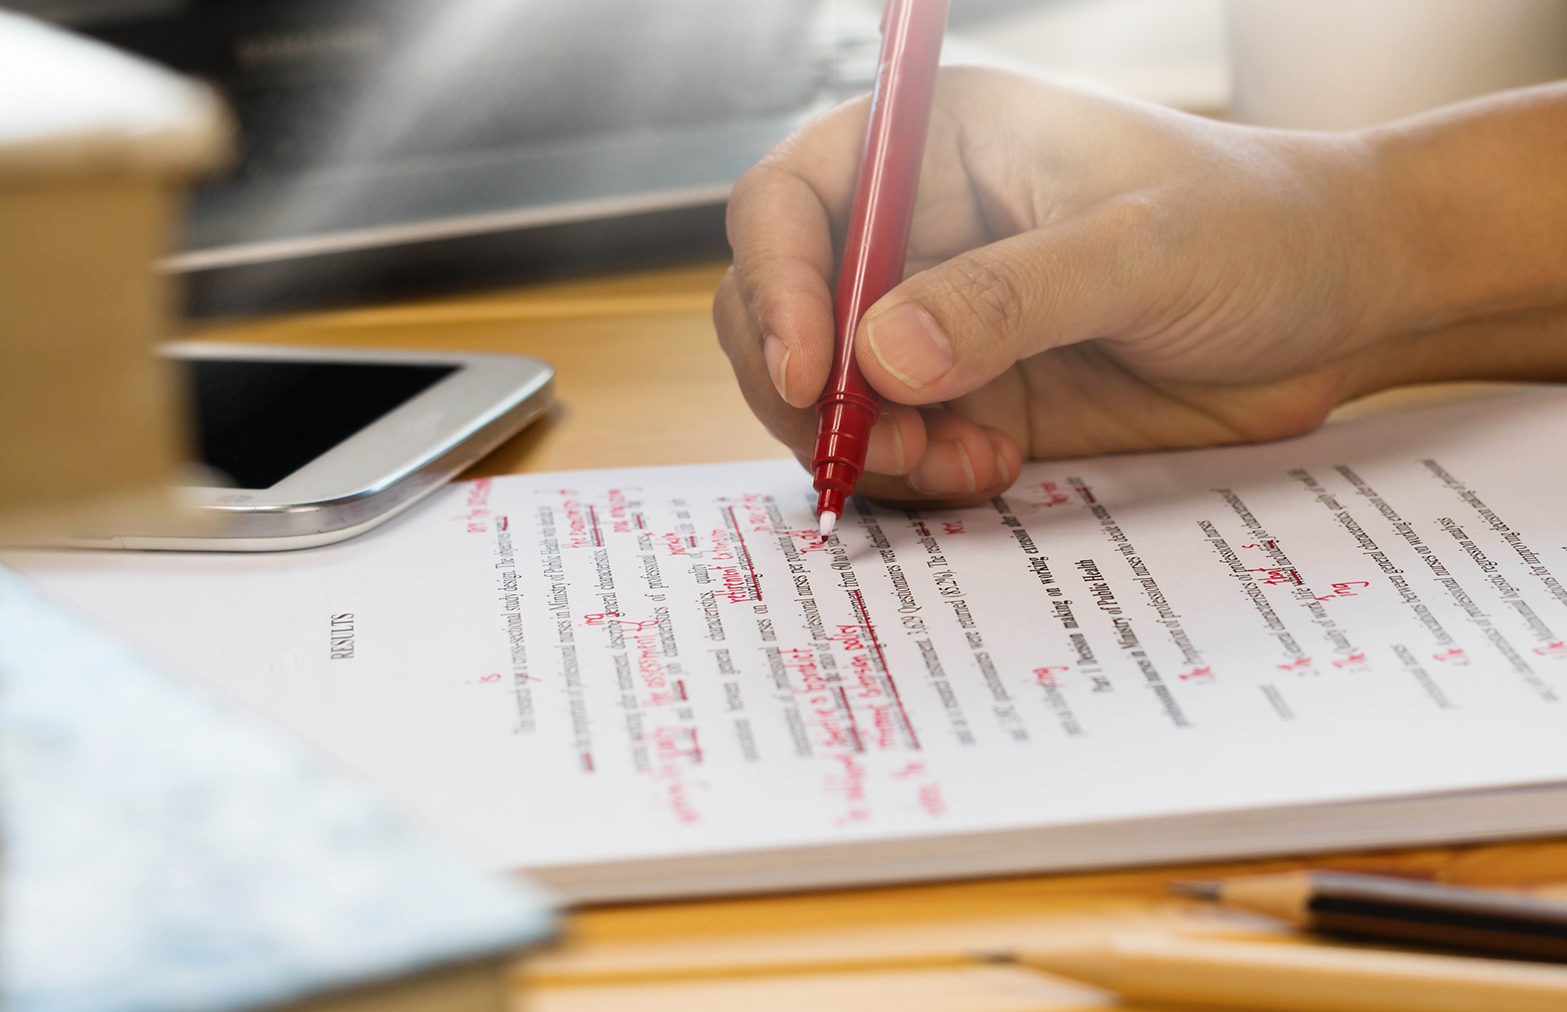 Editing and proofreading in North Carolina